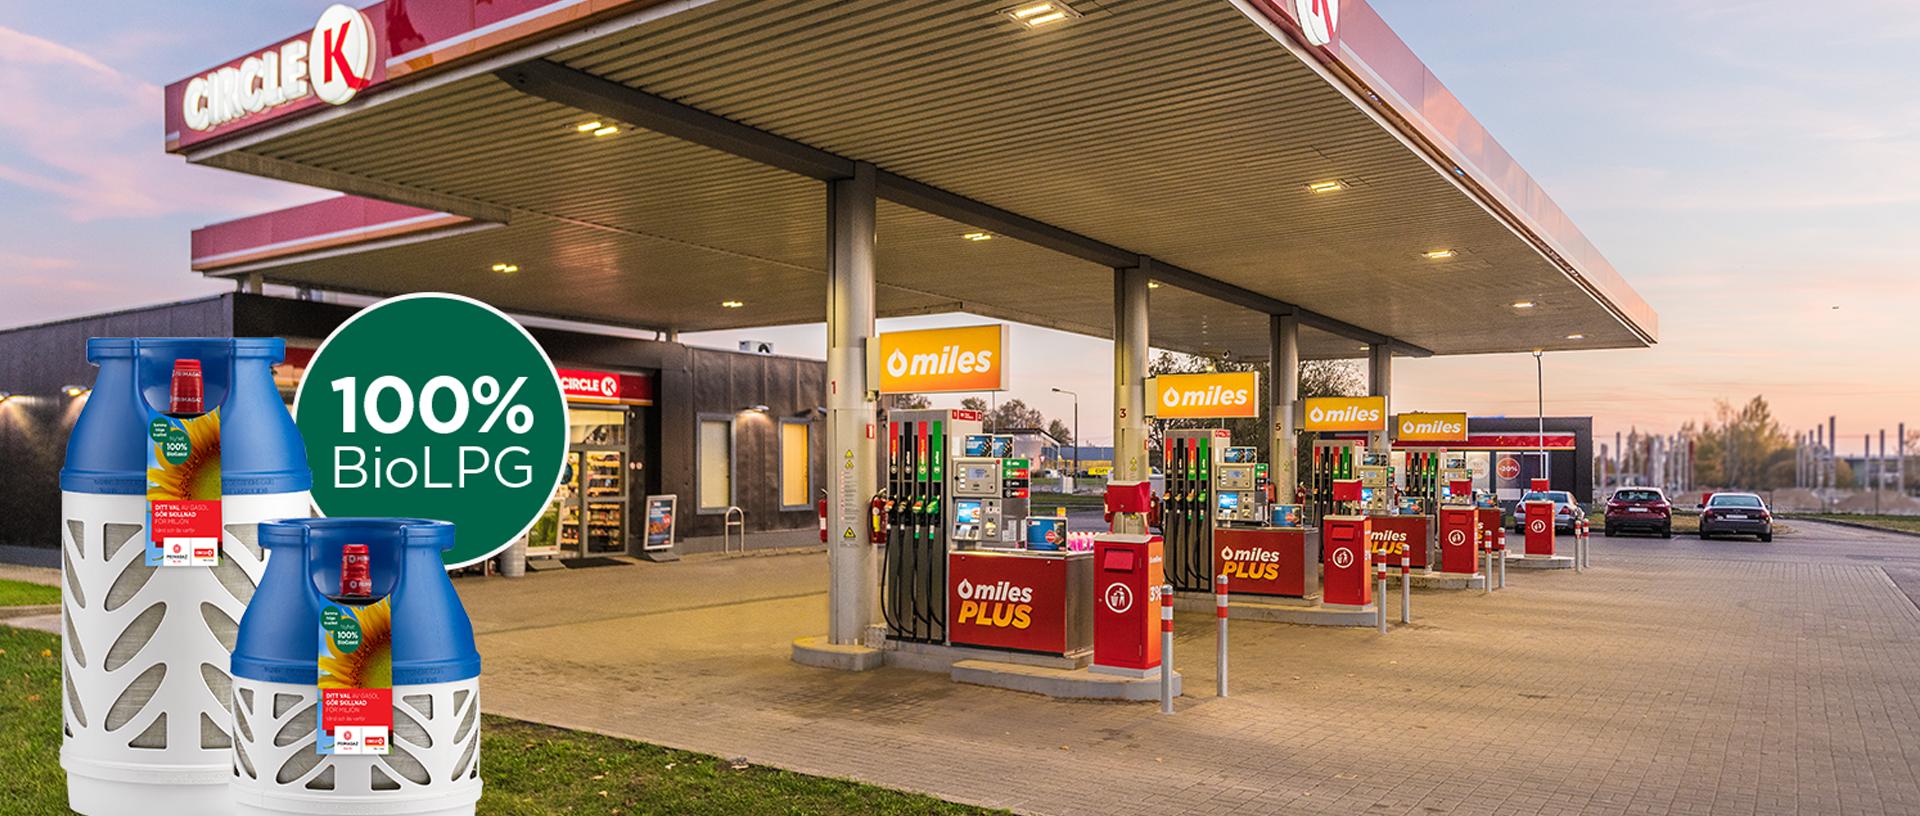 Circle K gas station in Sweden